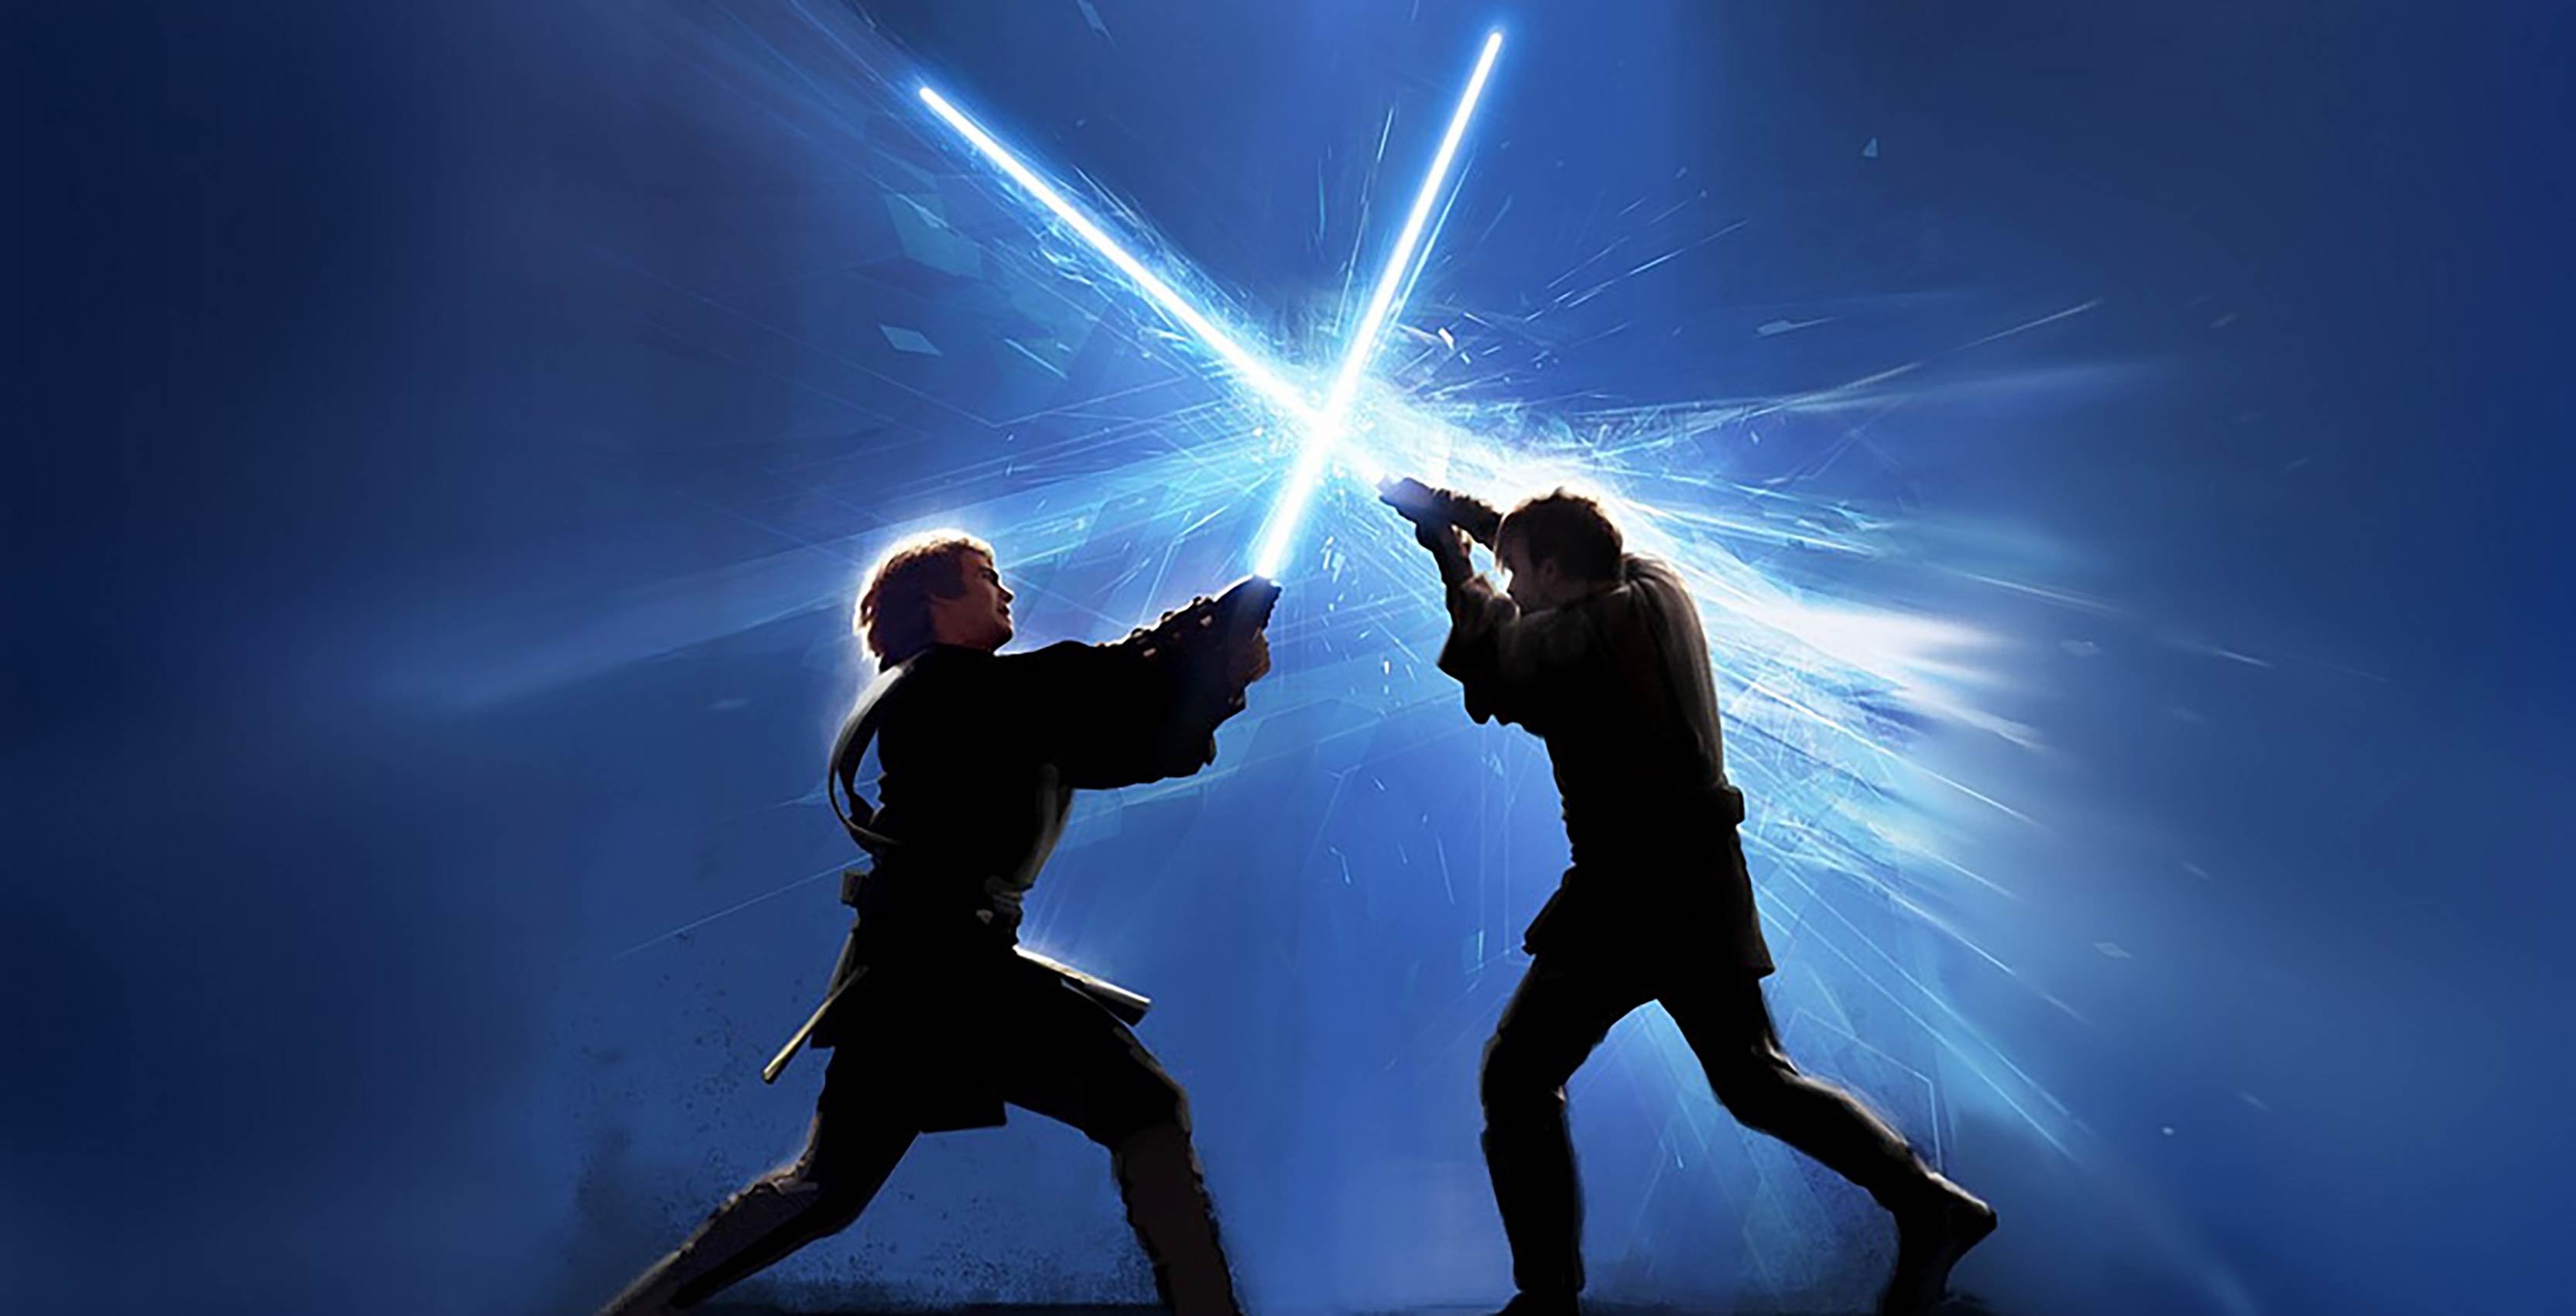 Anakin and Obi Wan light saber clashing